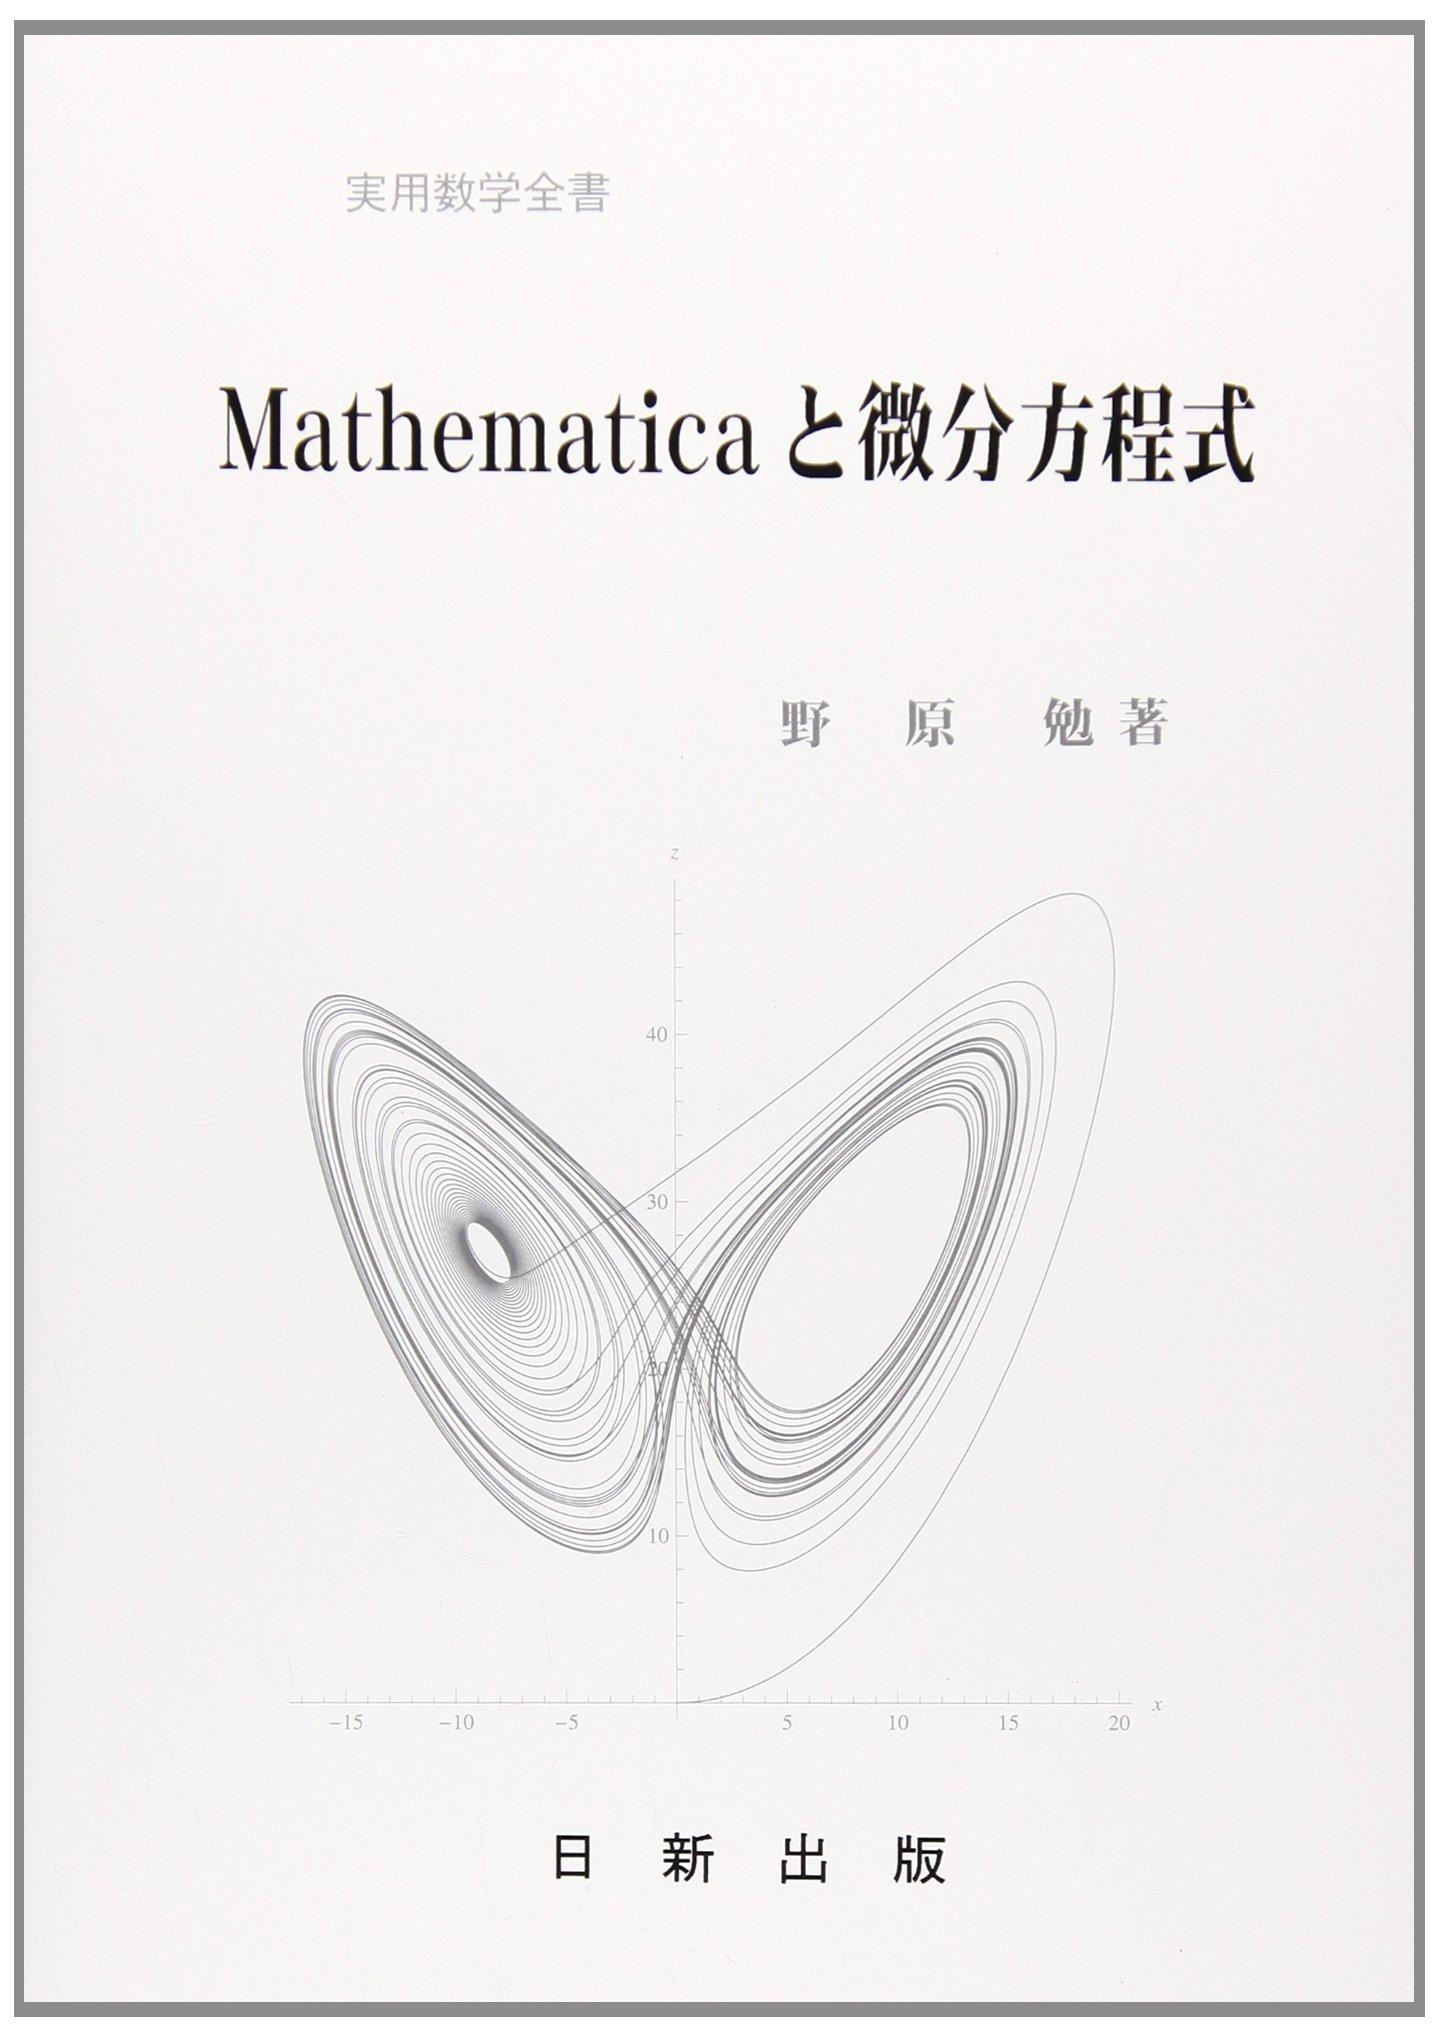 Read Online Masematika to bibun hoteishiki. PDF ePub fb2 ebook